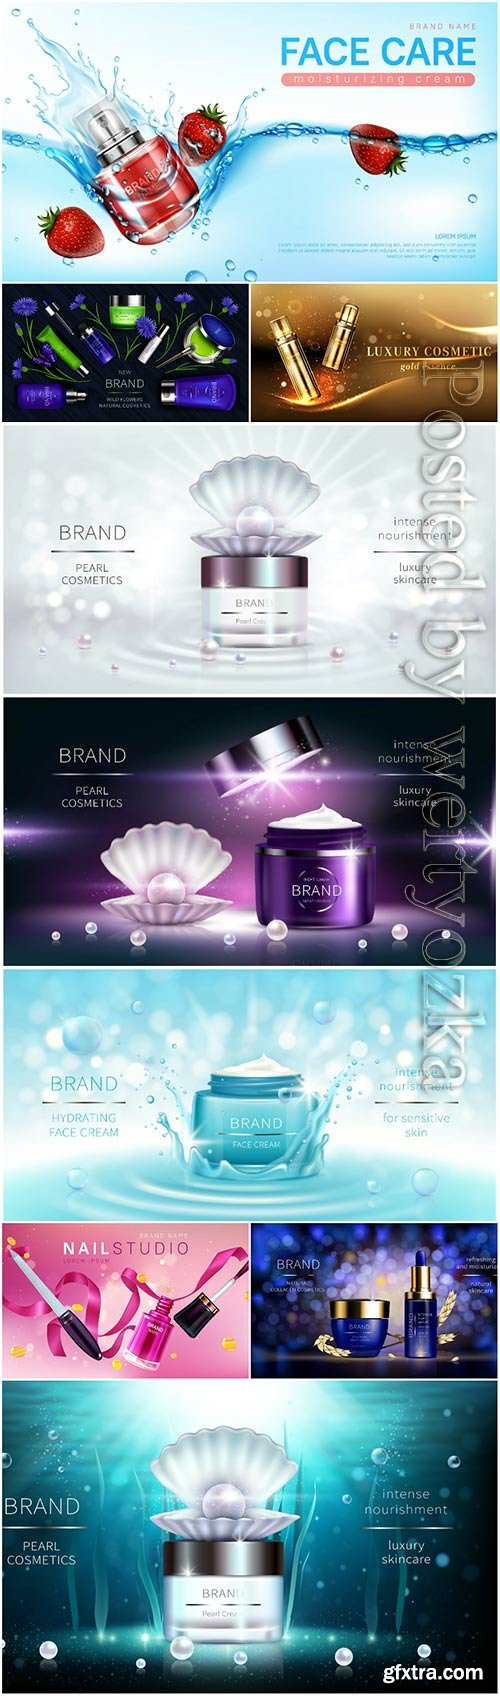 Cosmetics advertising templates in vector